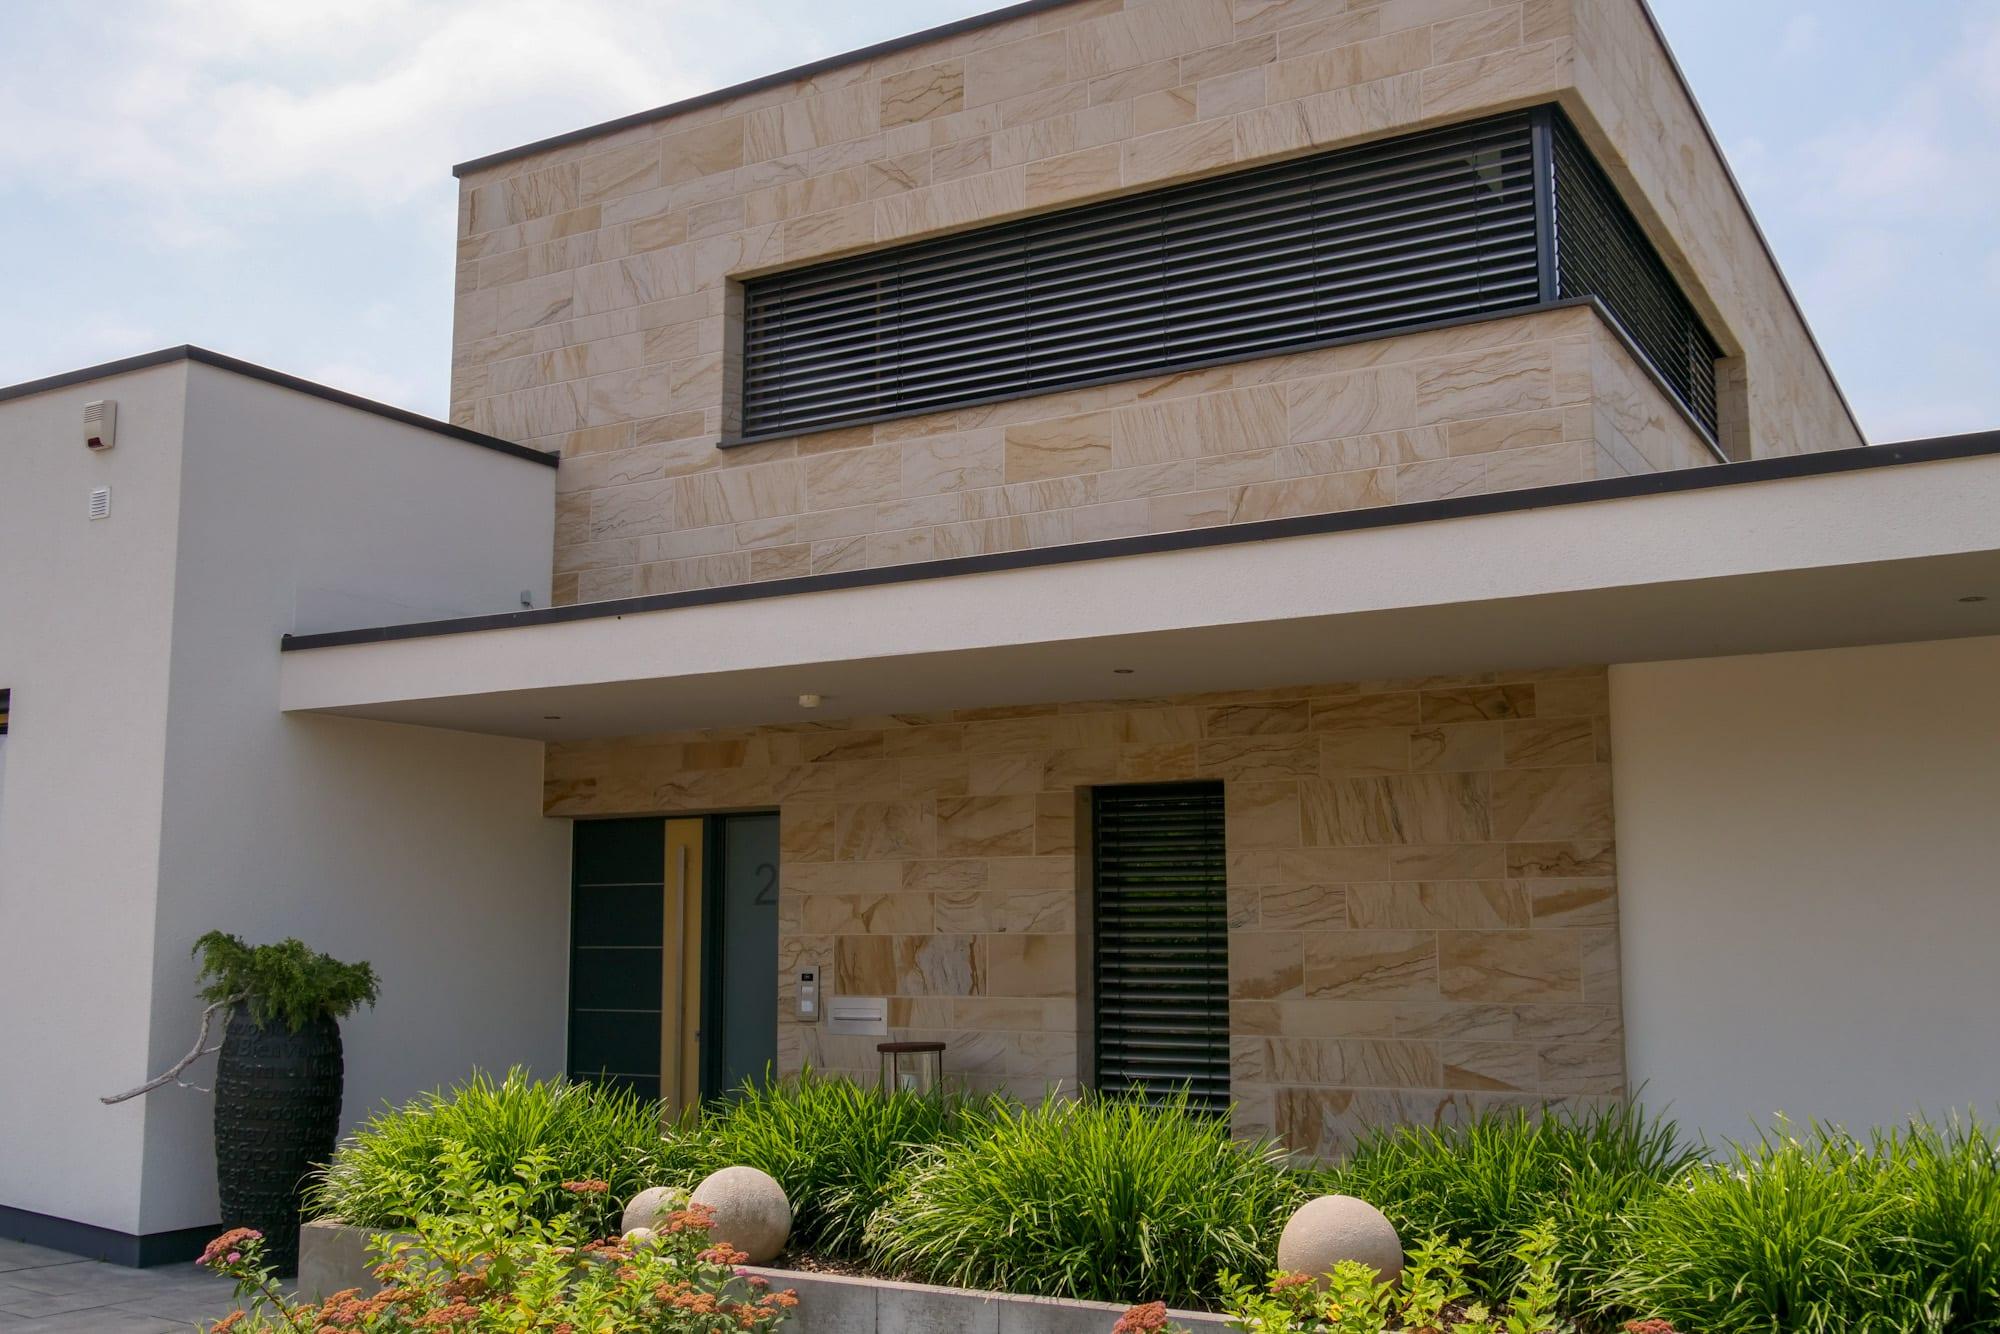 Sandsteinfassade, Wärmedämmung, Fassade kleve